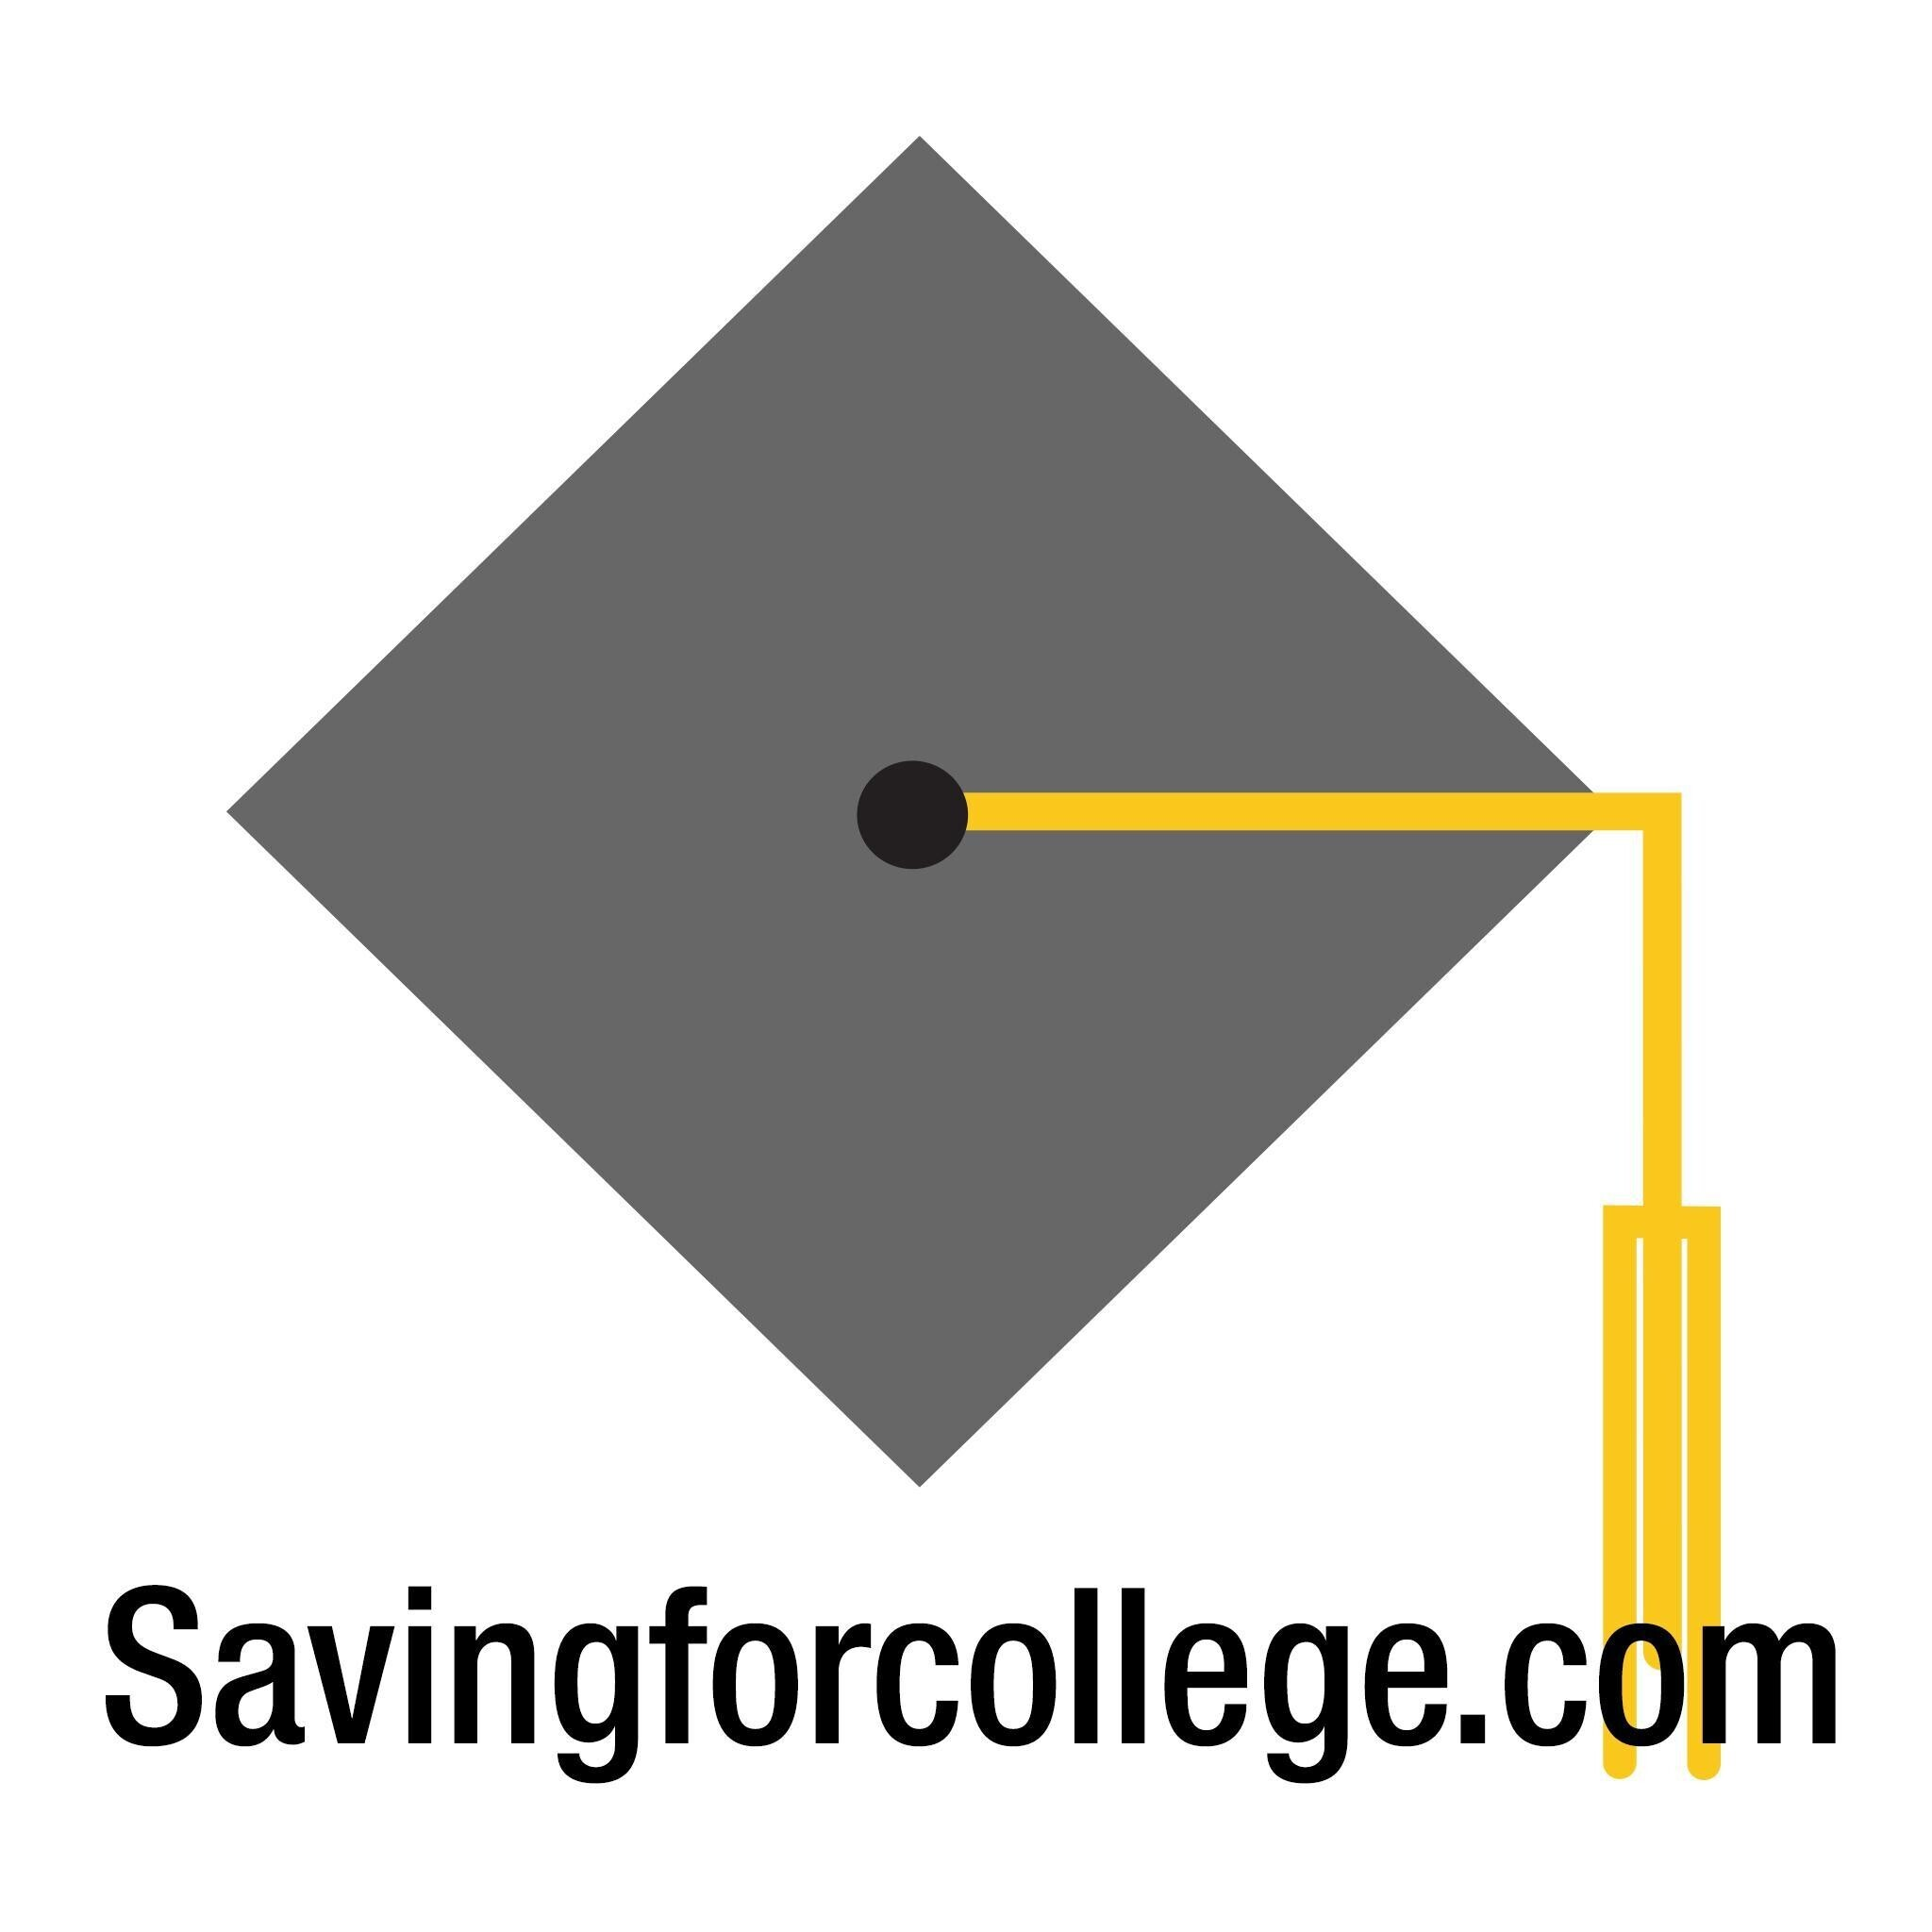 saving4college